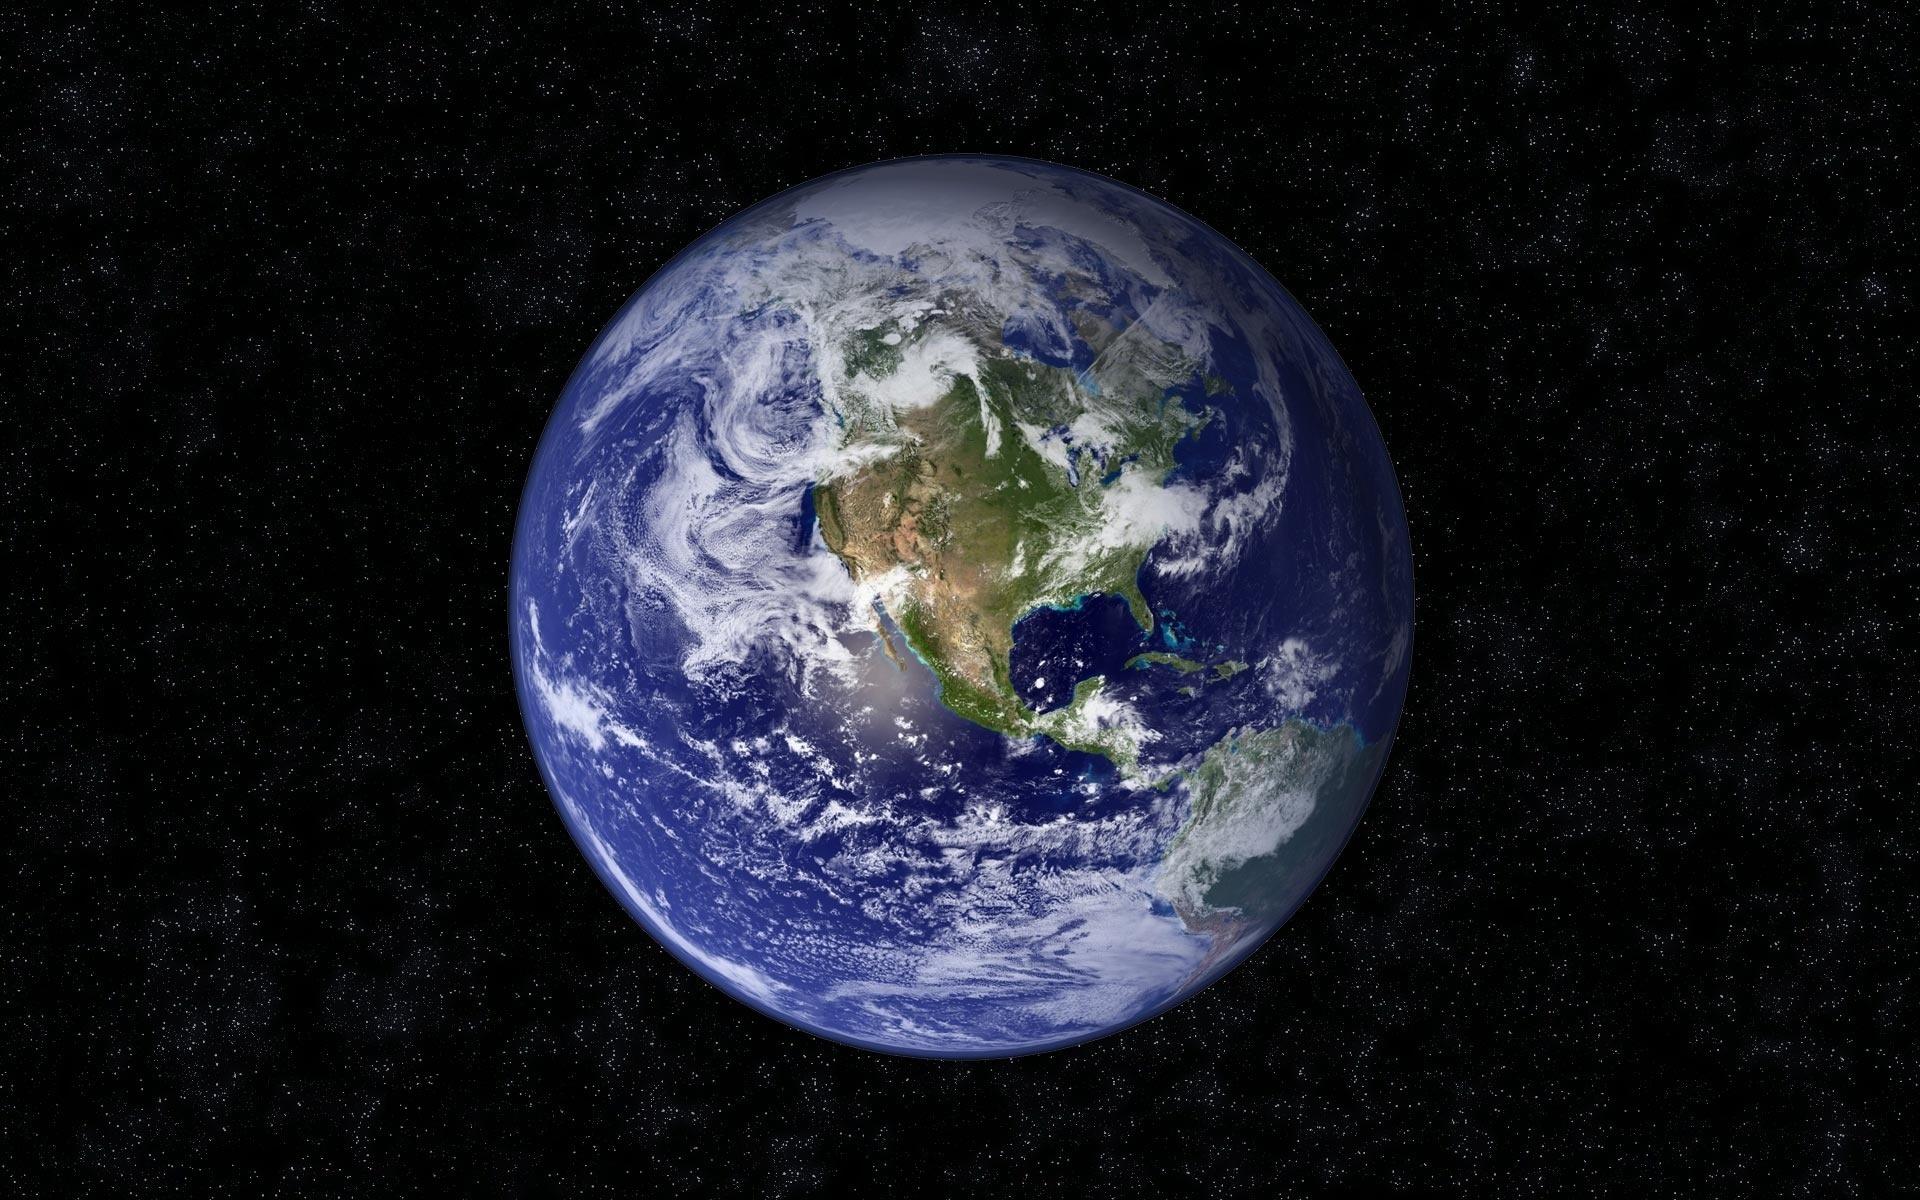 картинки про всю землю условиях полной антисанитарии